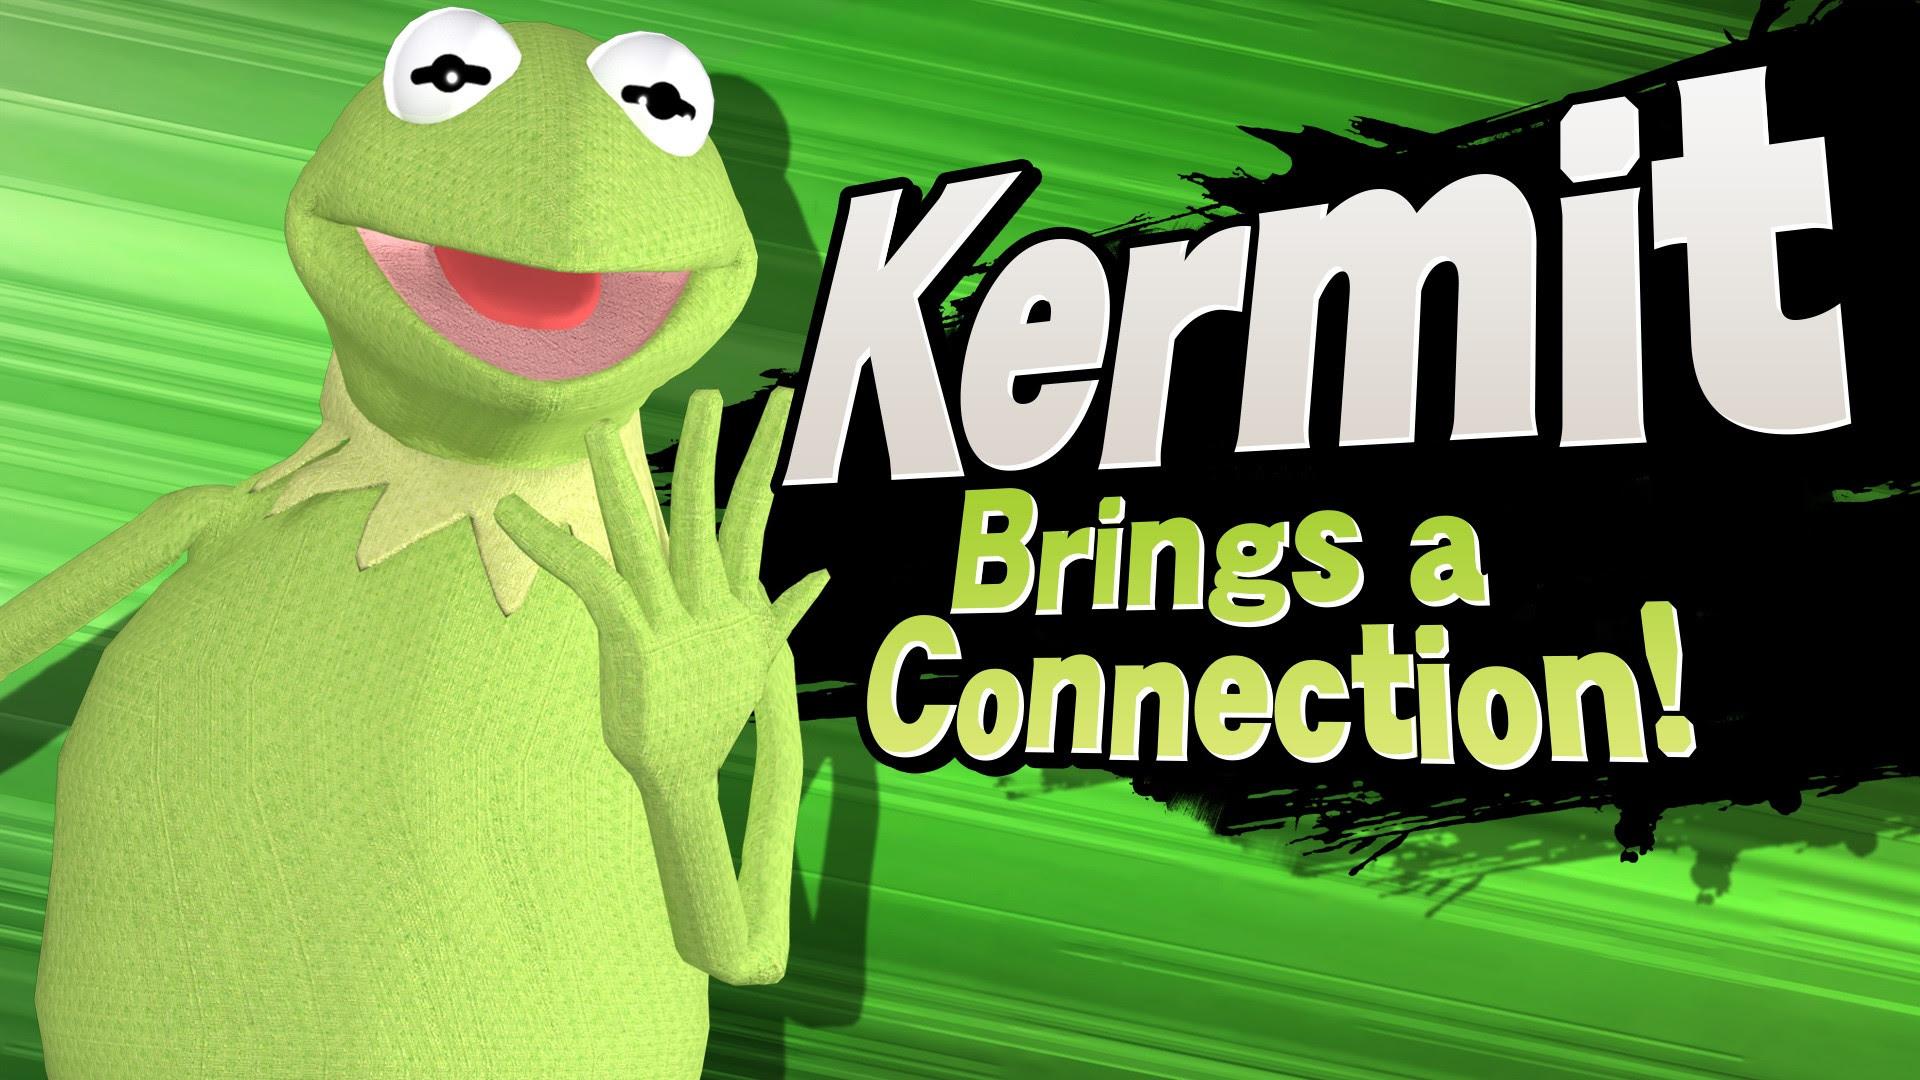 Kermit is back for more in Super Smash Bros. screenshot